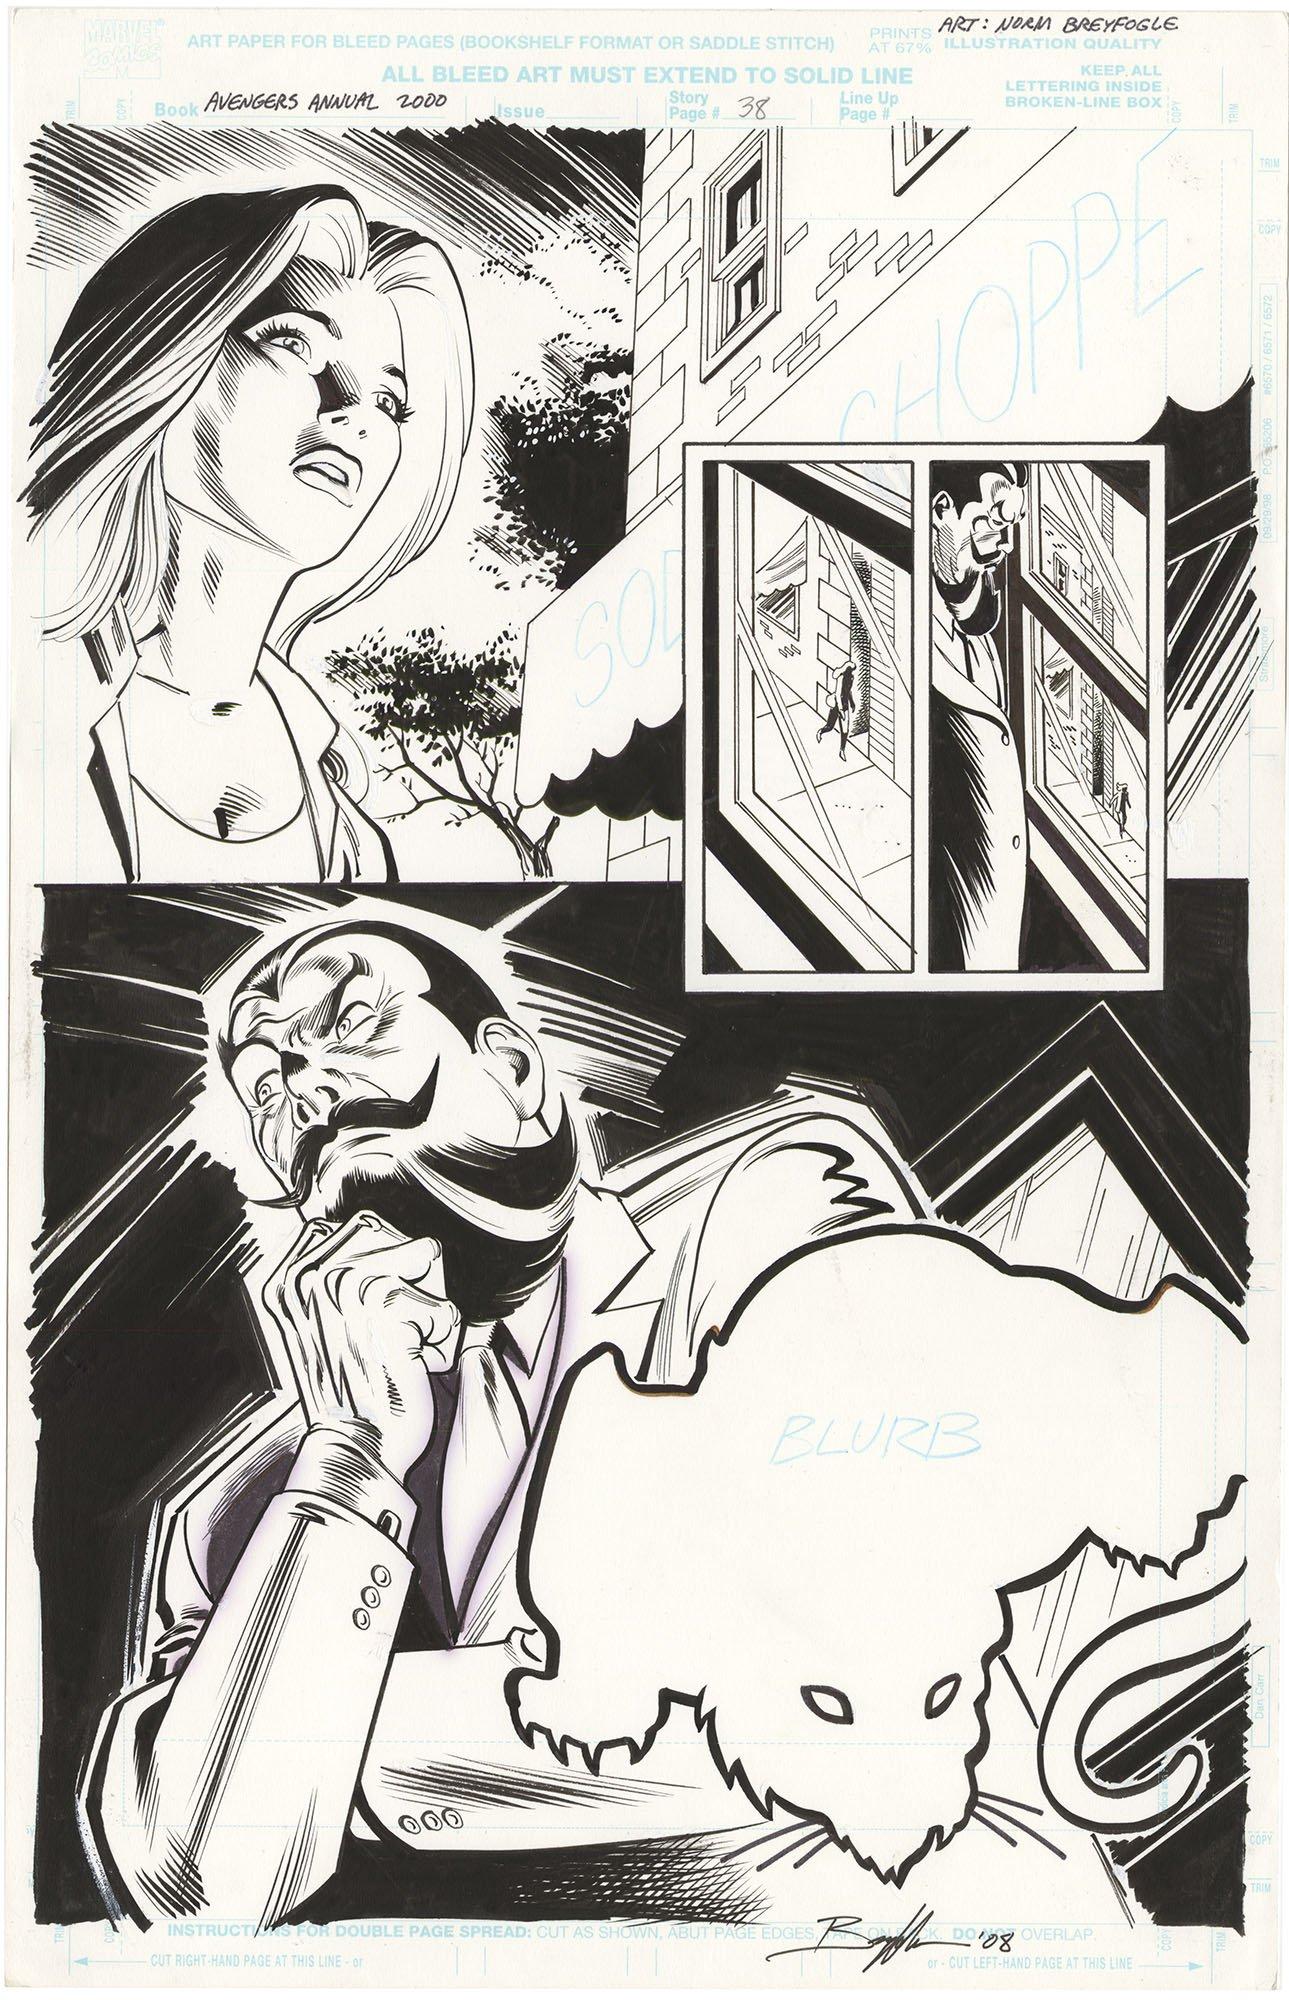 Avengers 2000 Annual #1 p38 (Half Splash)